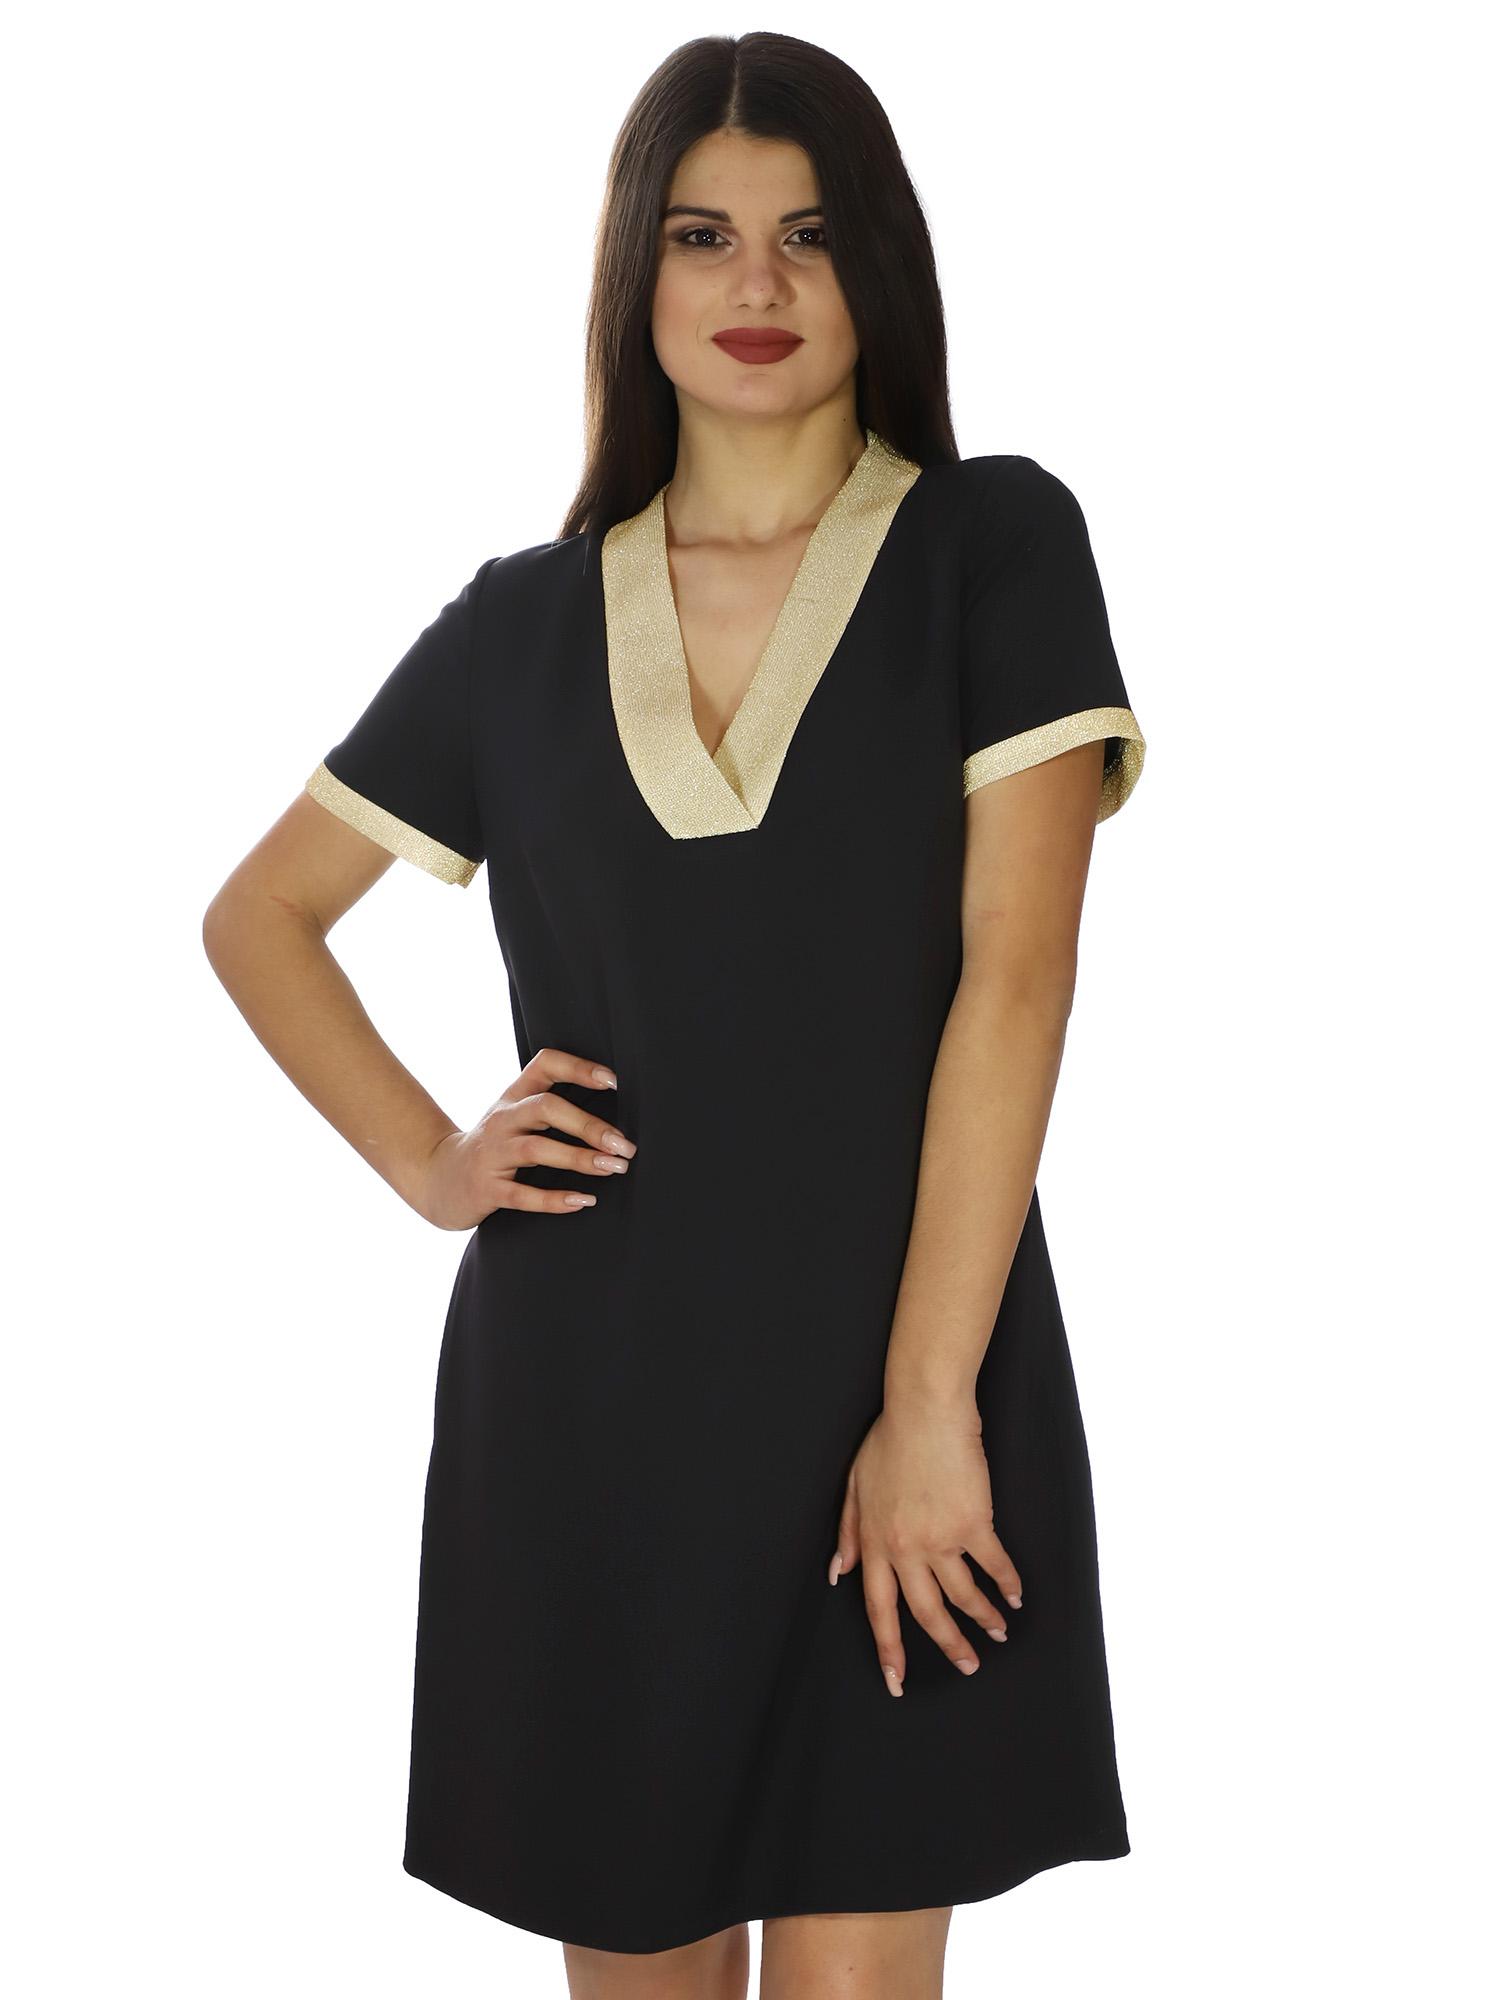 44581ade2a4 FOREL ΦΟΡΕΜΑ ΚΟΝΤΟ – ParousiaFashion.gr   Το Απόλυτο Eshop Γυναικείων  Ρούχων & Αξεσουάρ